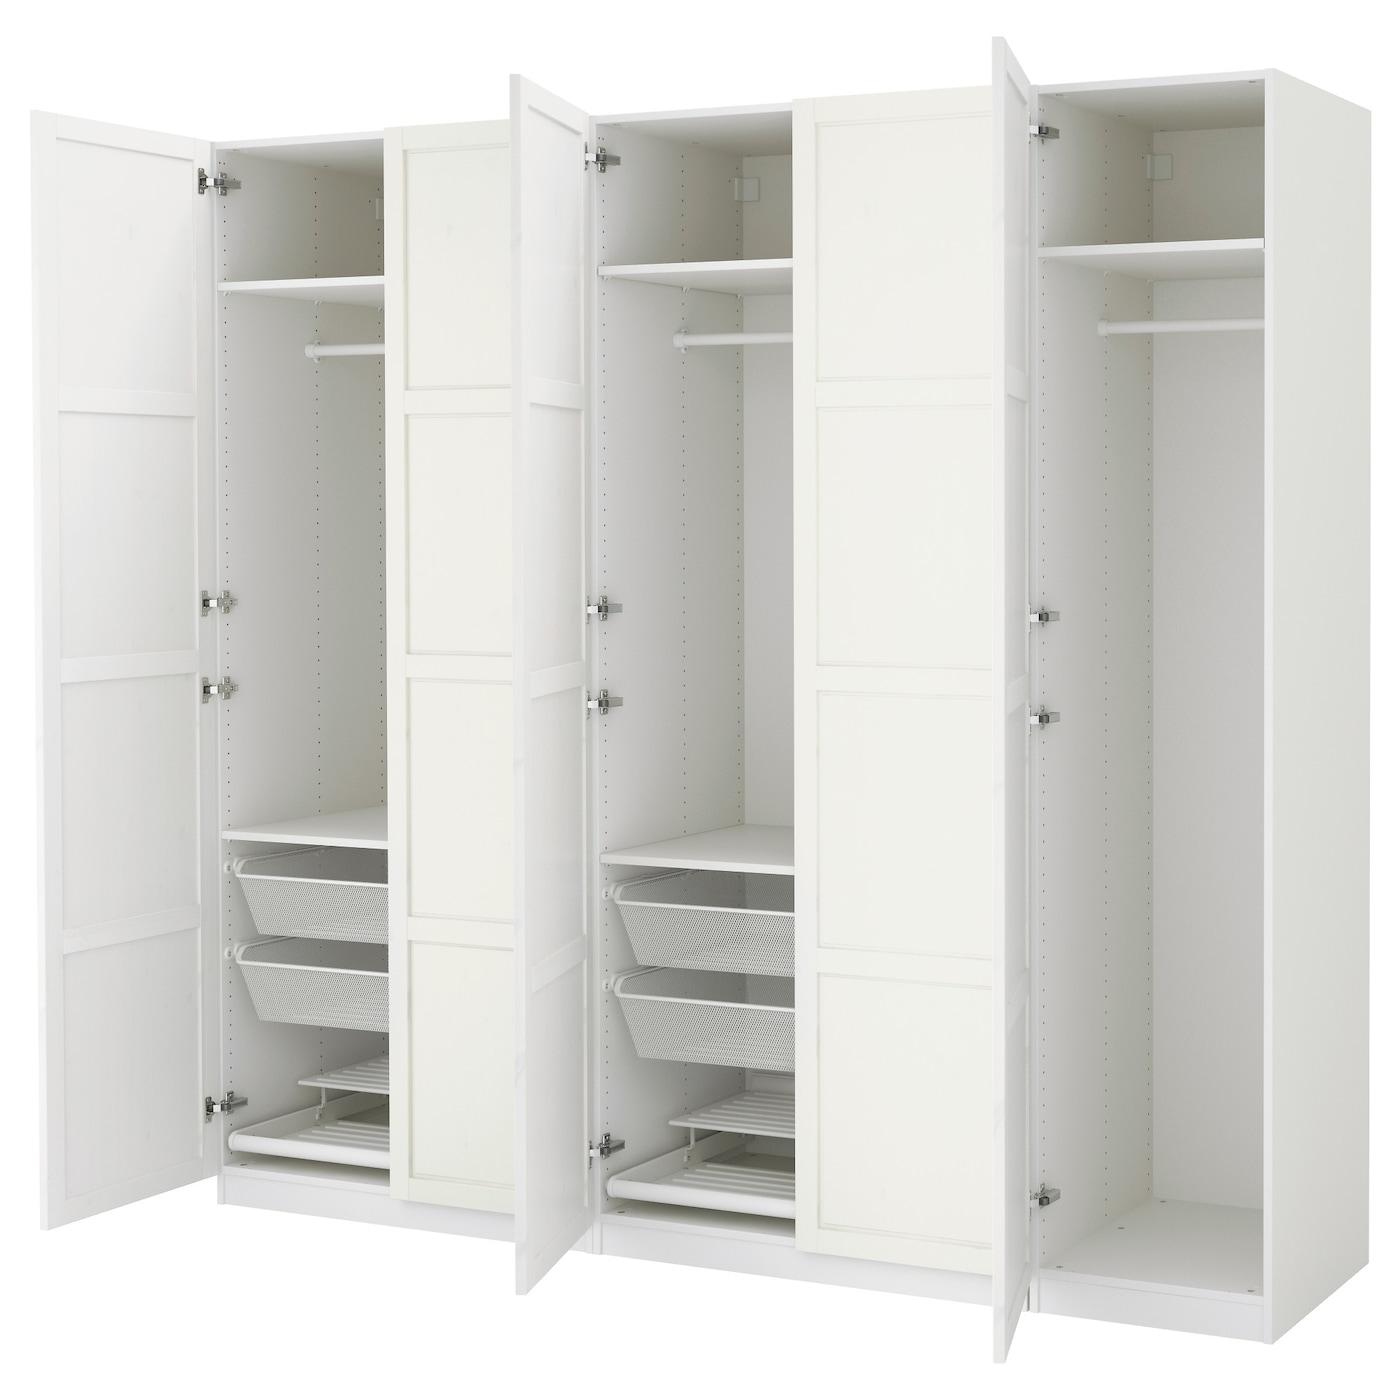 wardrobe 8 feet. ikea pax wardrobe 10 year guarantee read about the terms in brochure 8 feet e